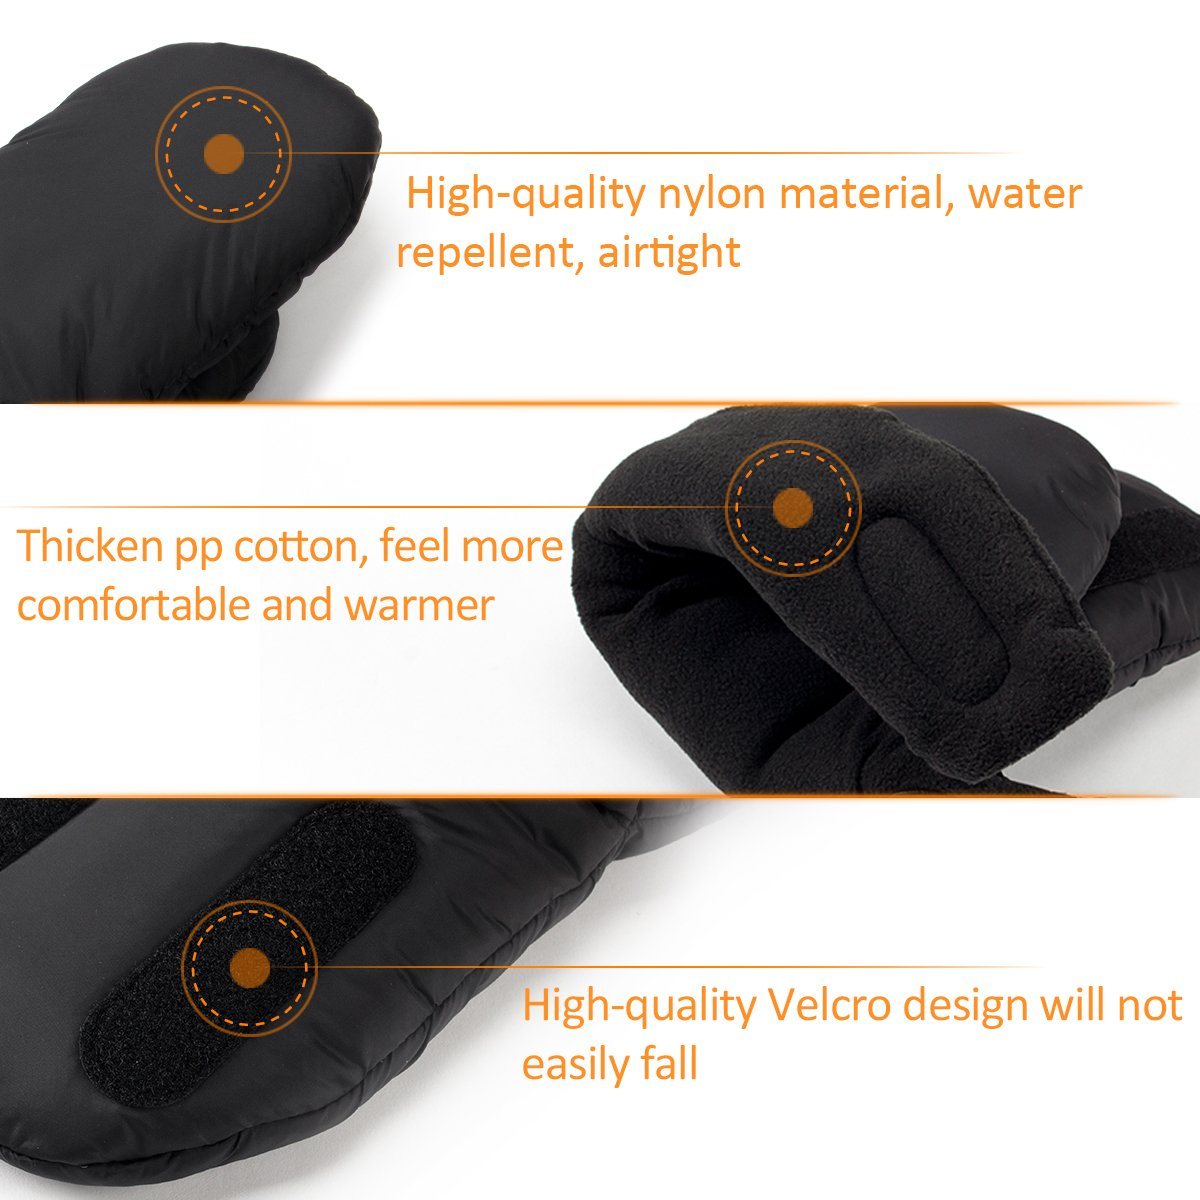 Biubee Stroller Hand Muff Winter Warm Pram Mitten Gloves for Parents and Caregivers Waterproof Anti-Freeze Black by Biubee (Image #2)